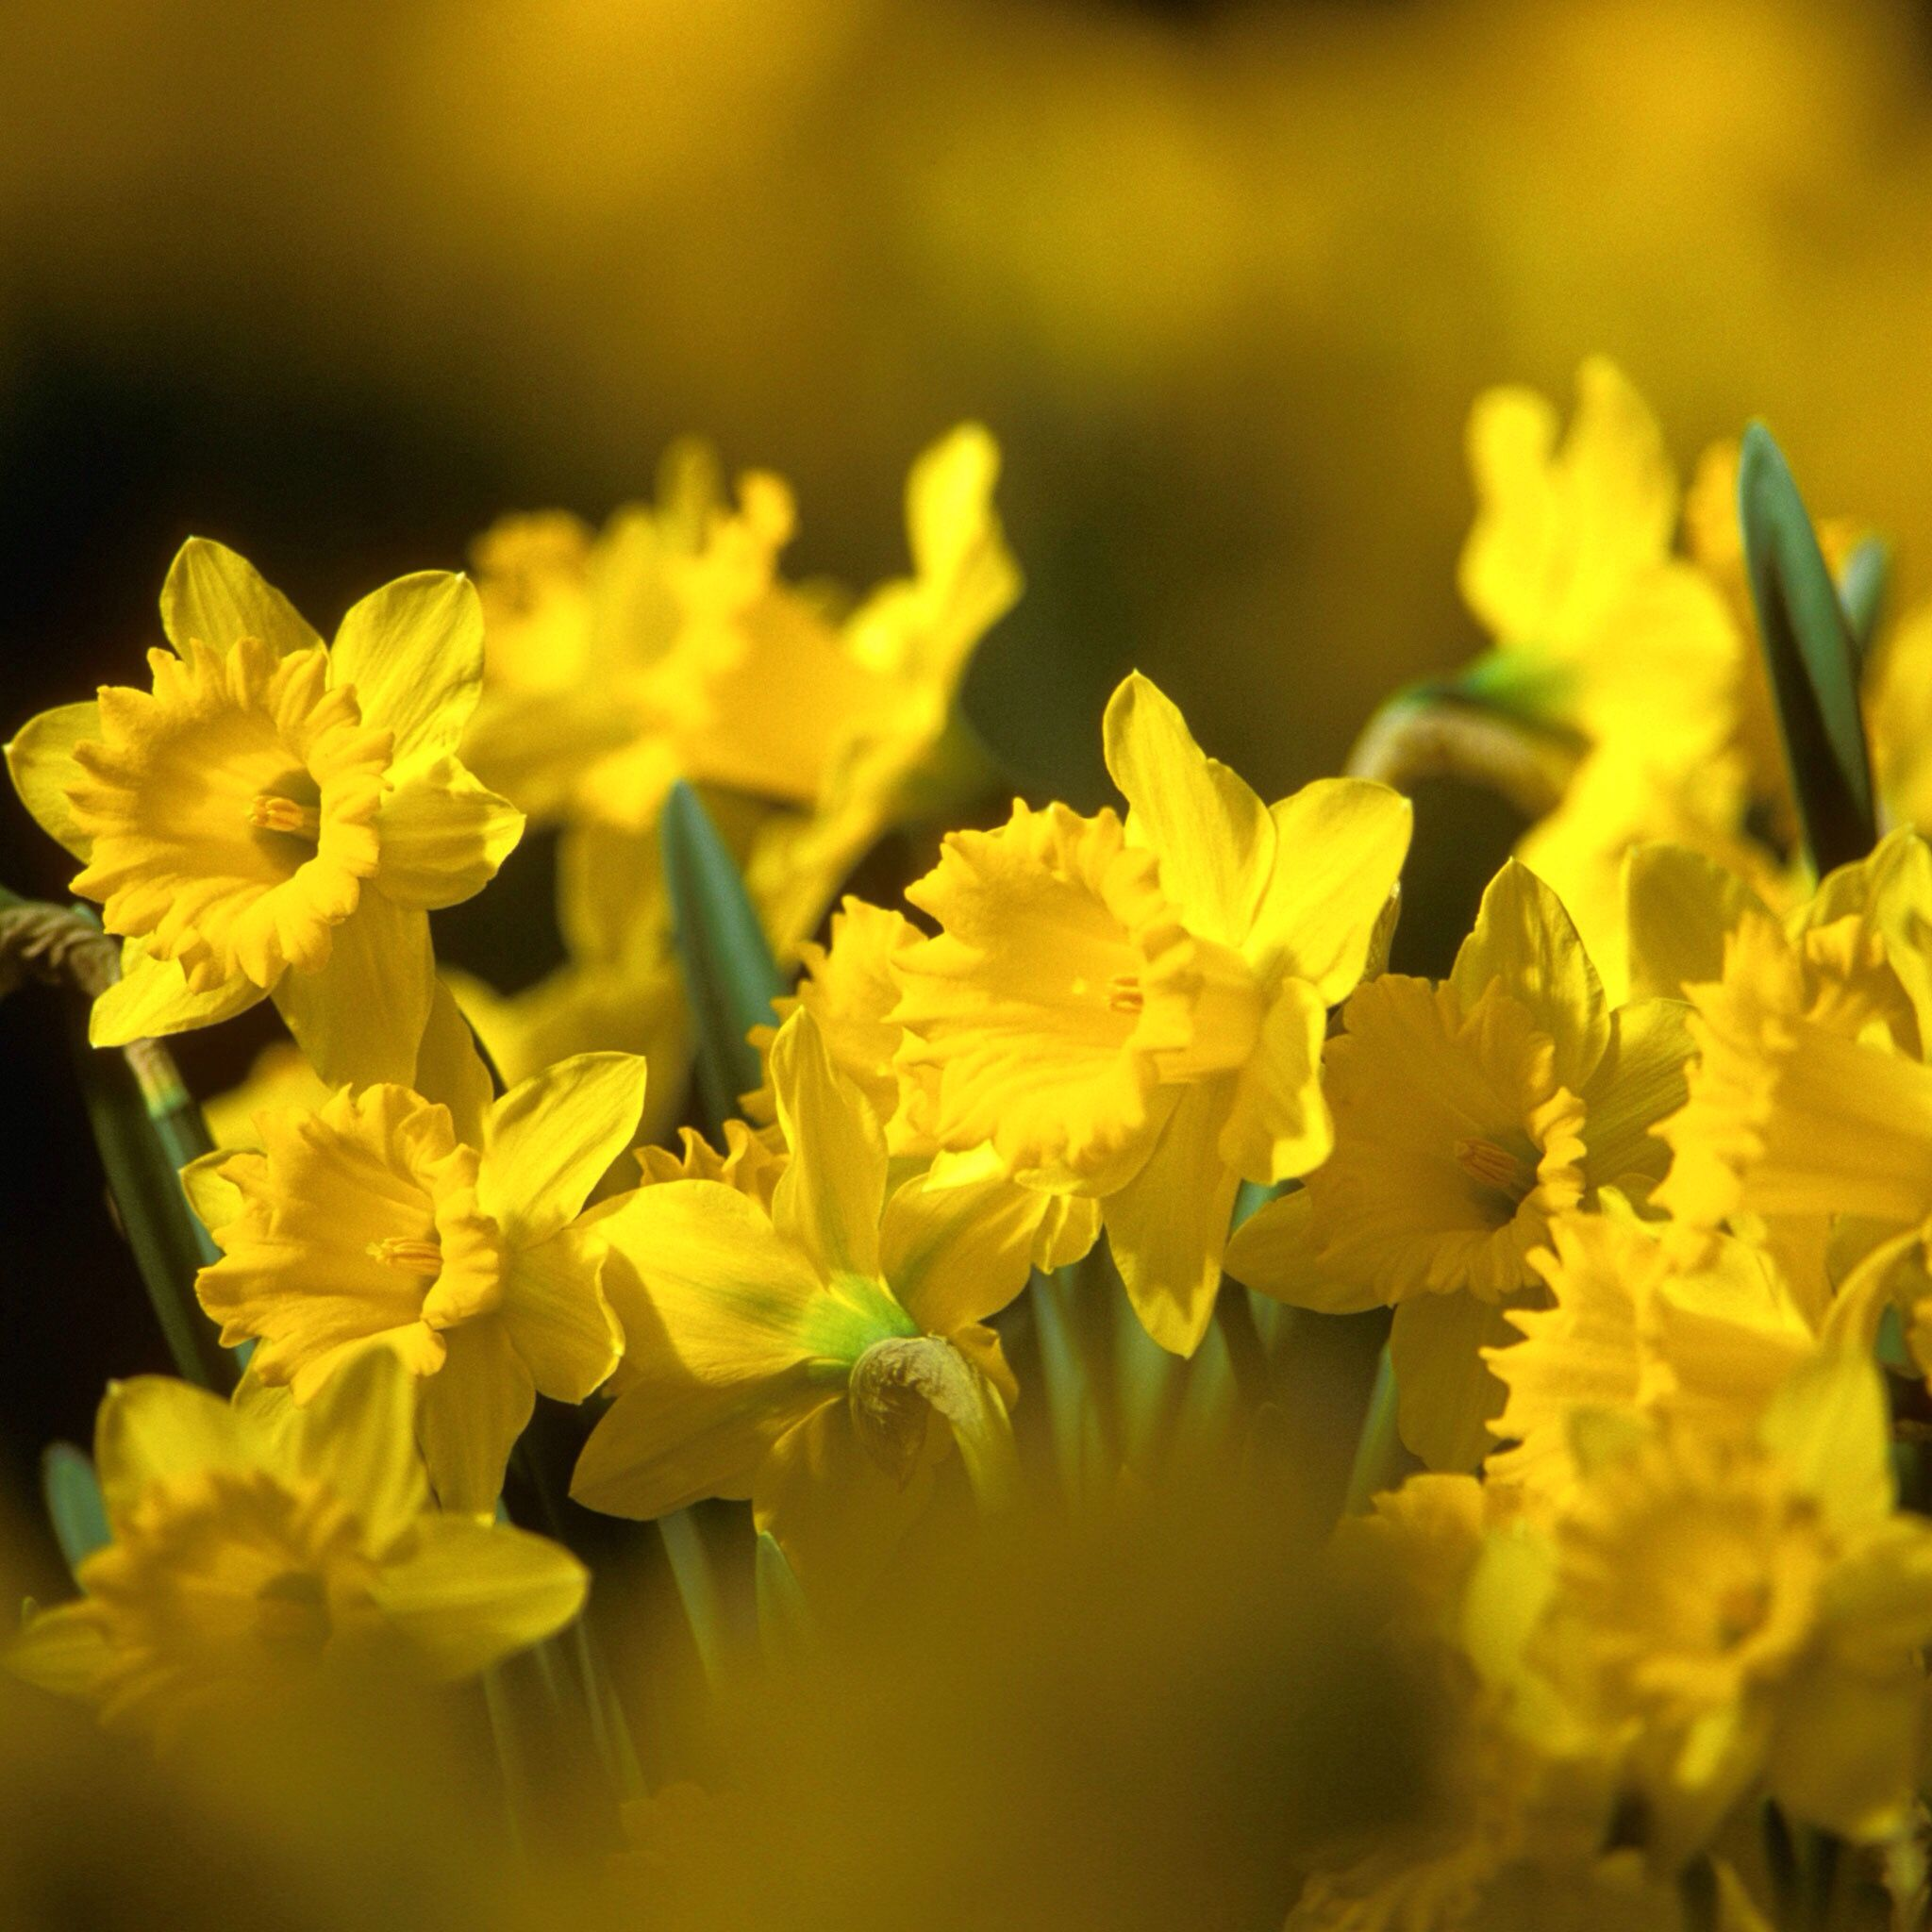 Pin By Dani Ela On Gelb Yellow Pinterest